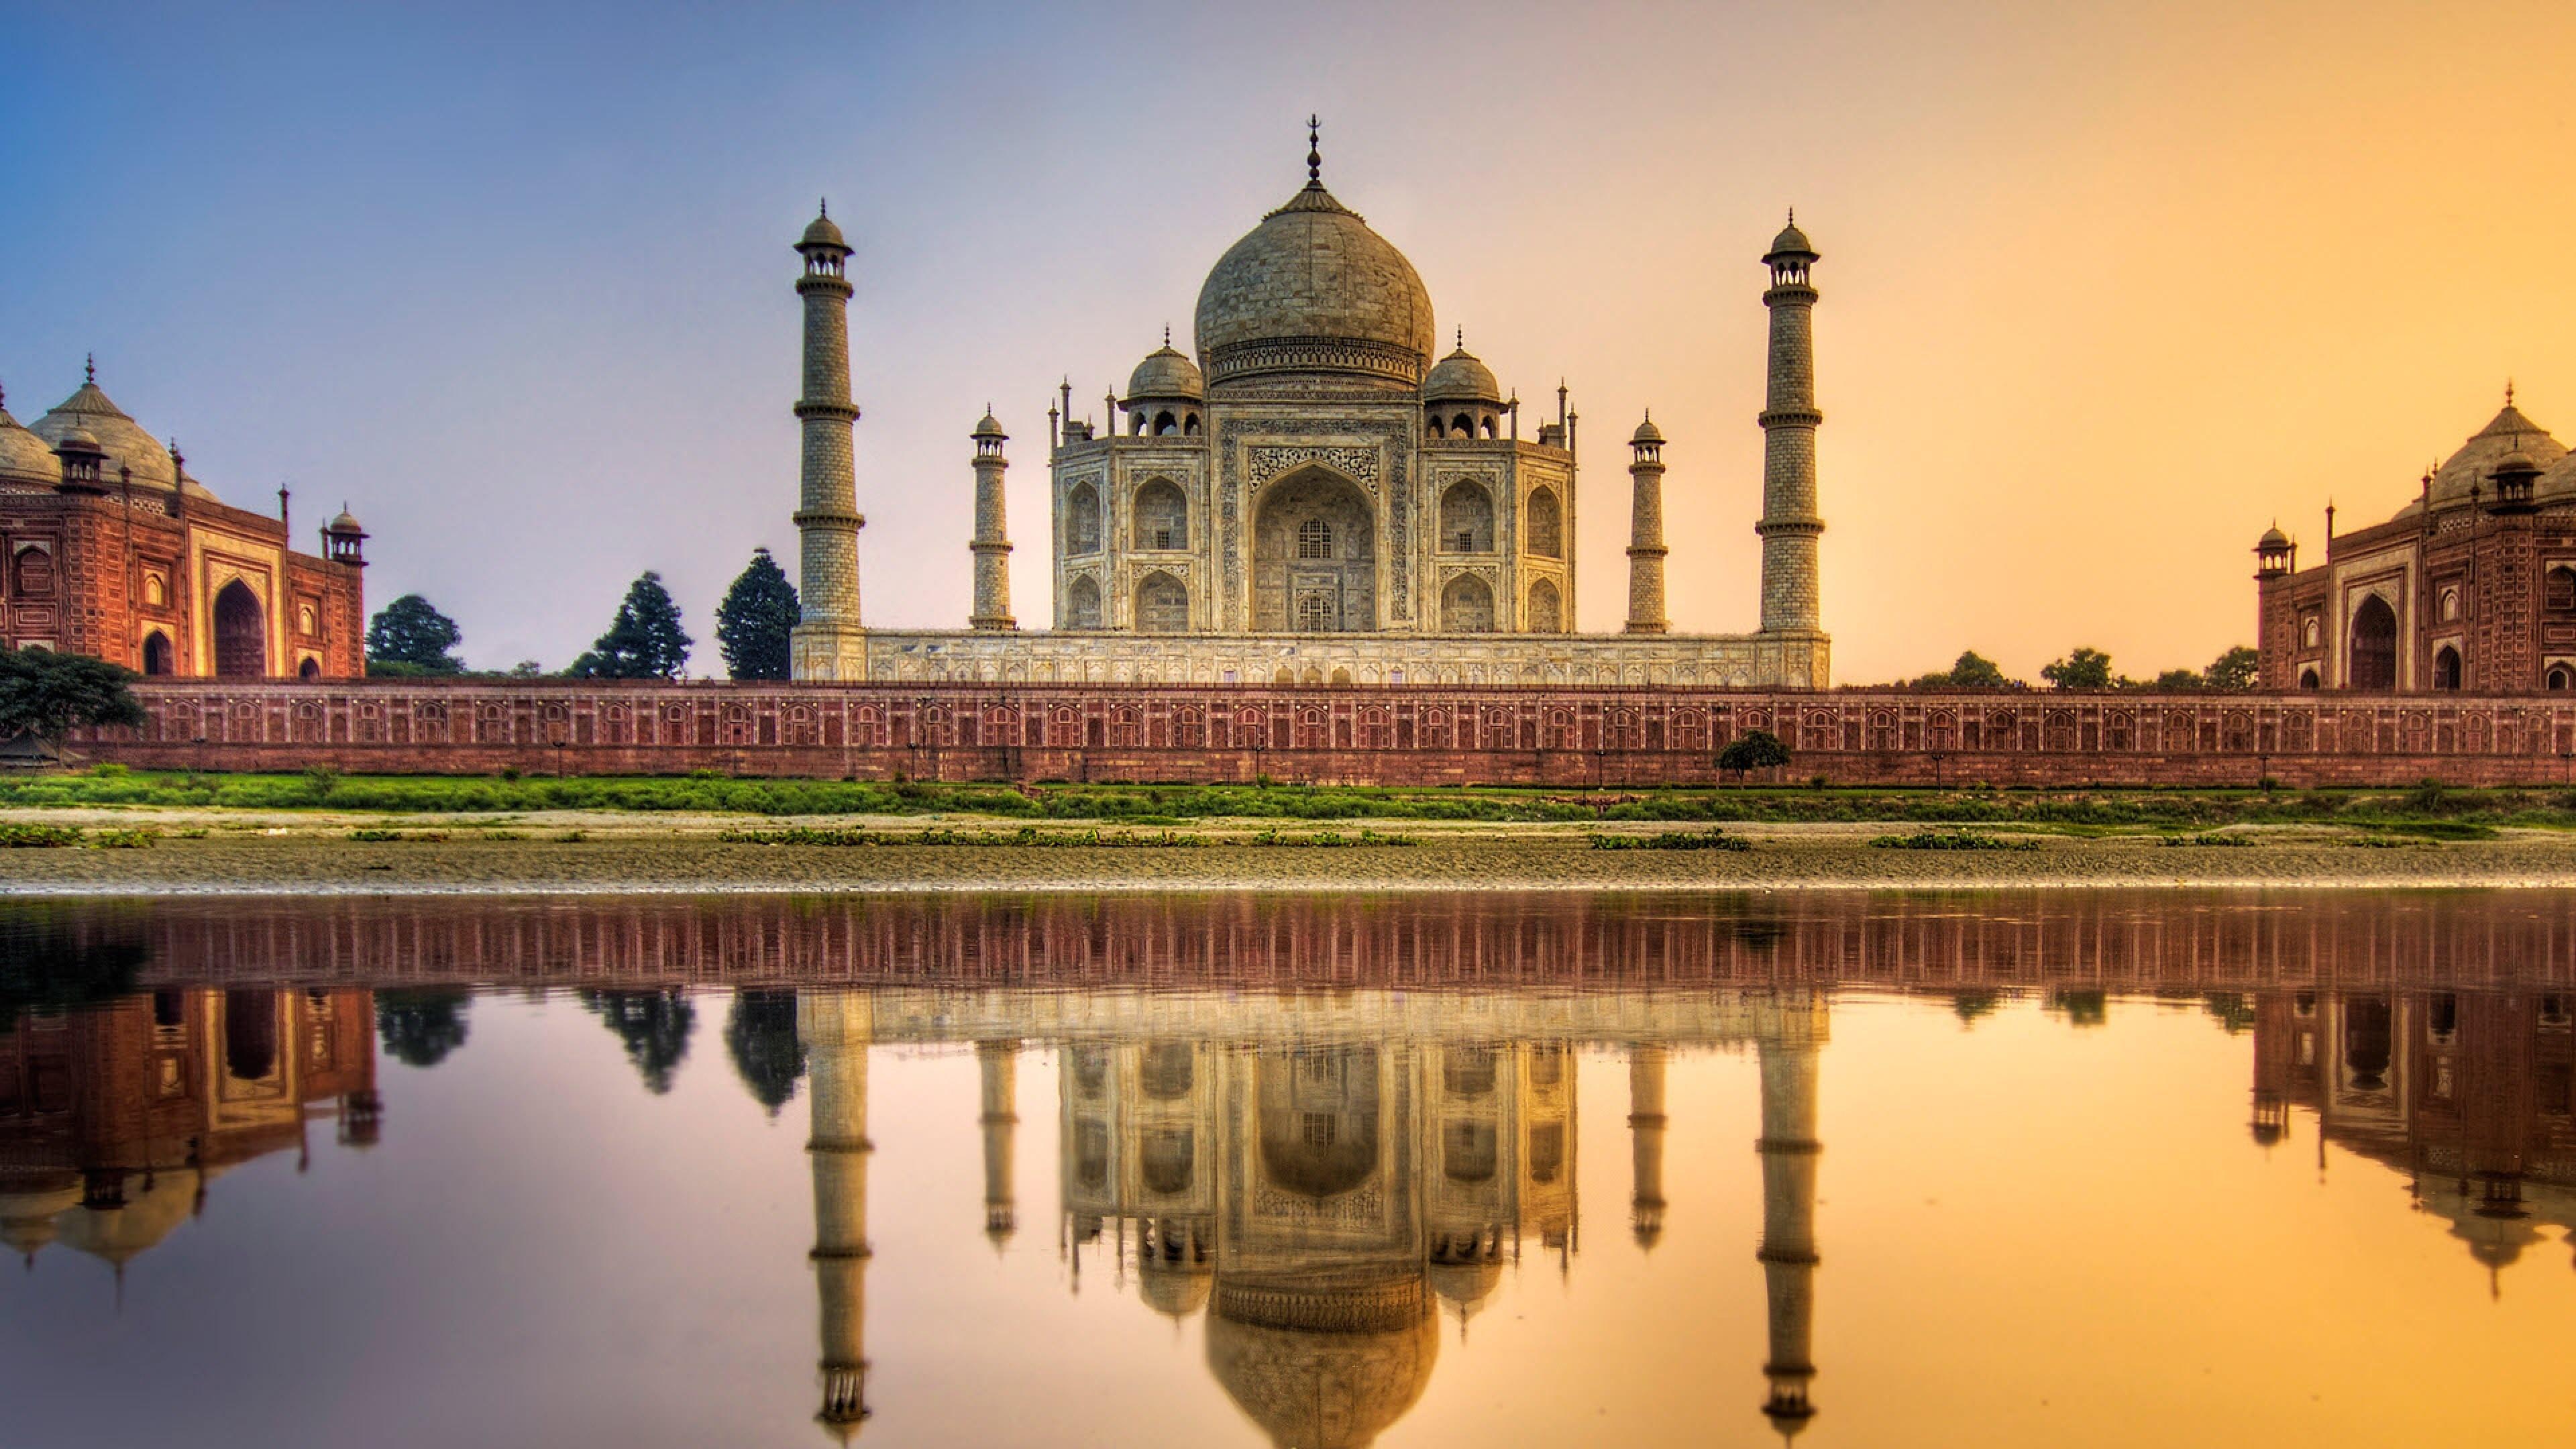 Preview wallpaper taj mahal, agra, india, mausoleum, mosque 3840×2160